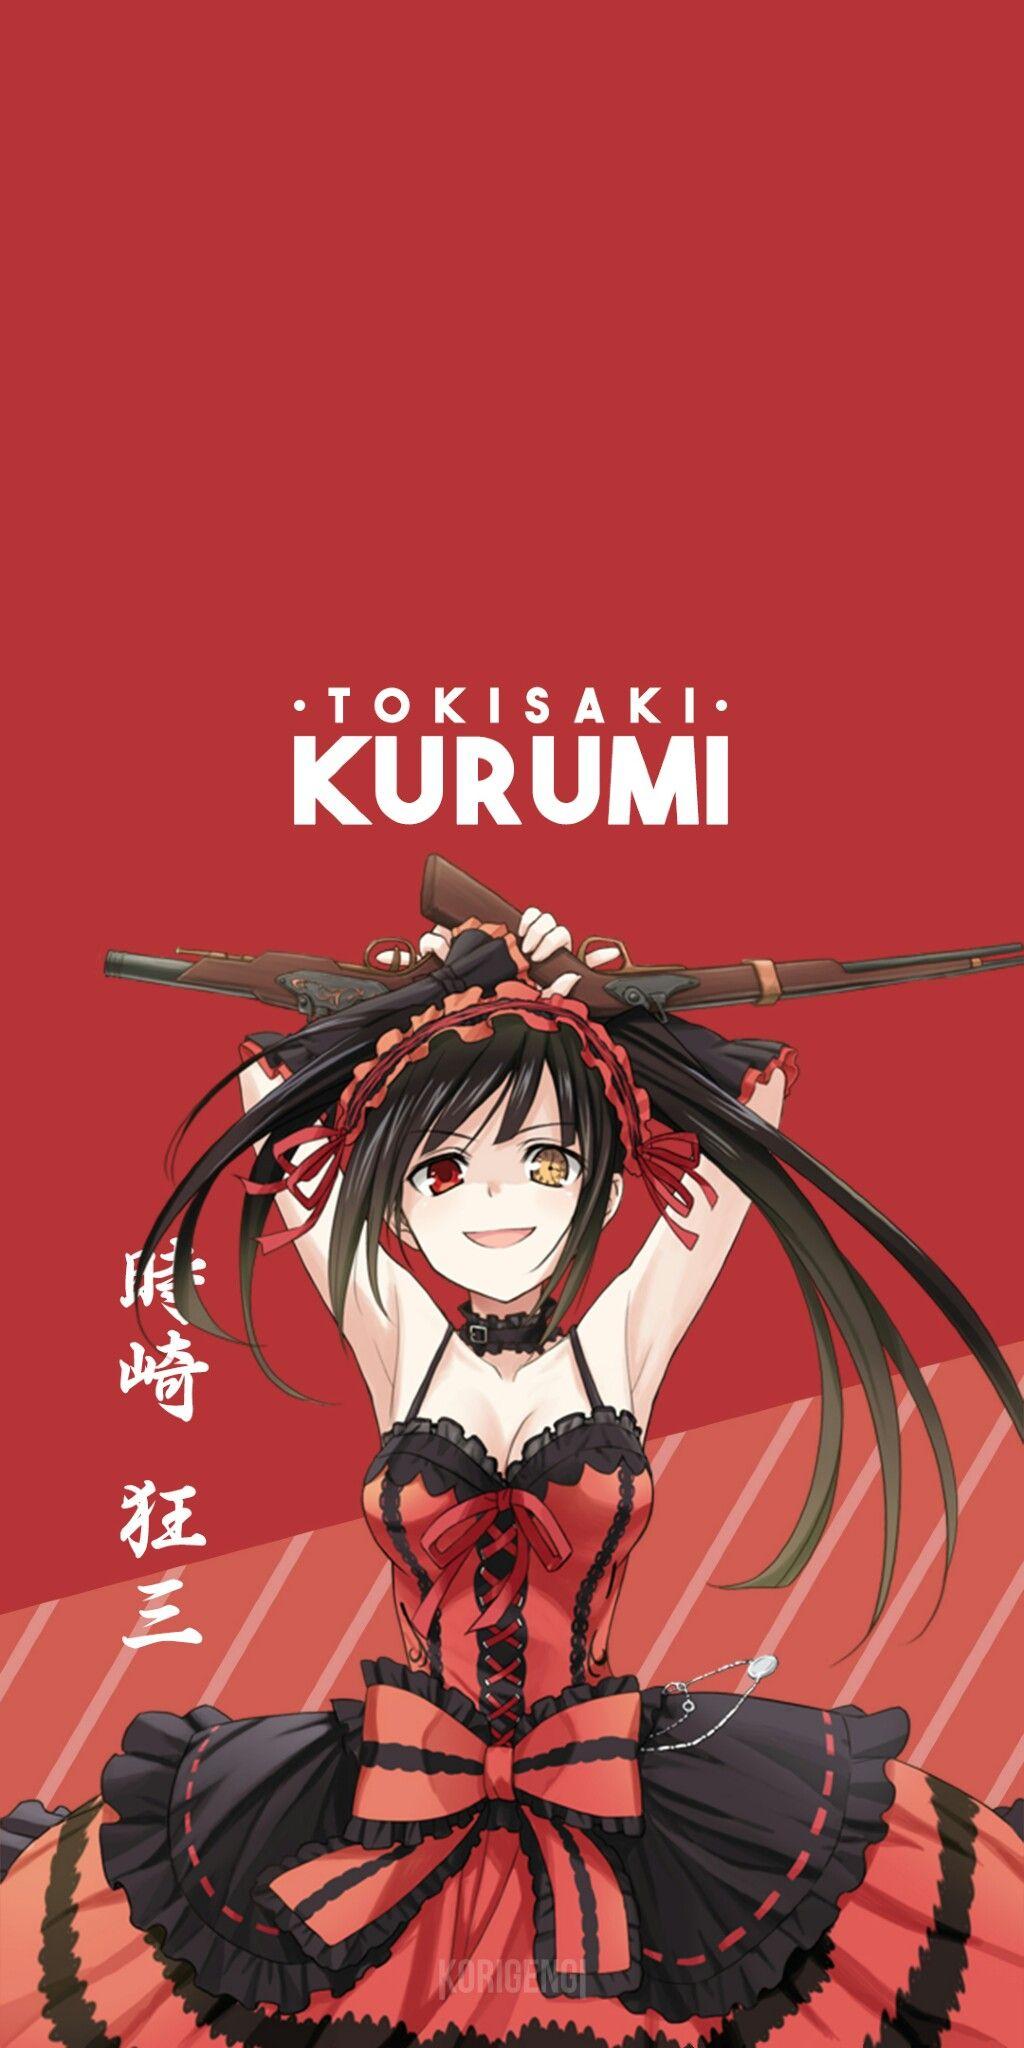 Tokisaki Kurumi (Date A Live) Personajes de anime